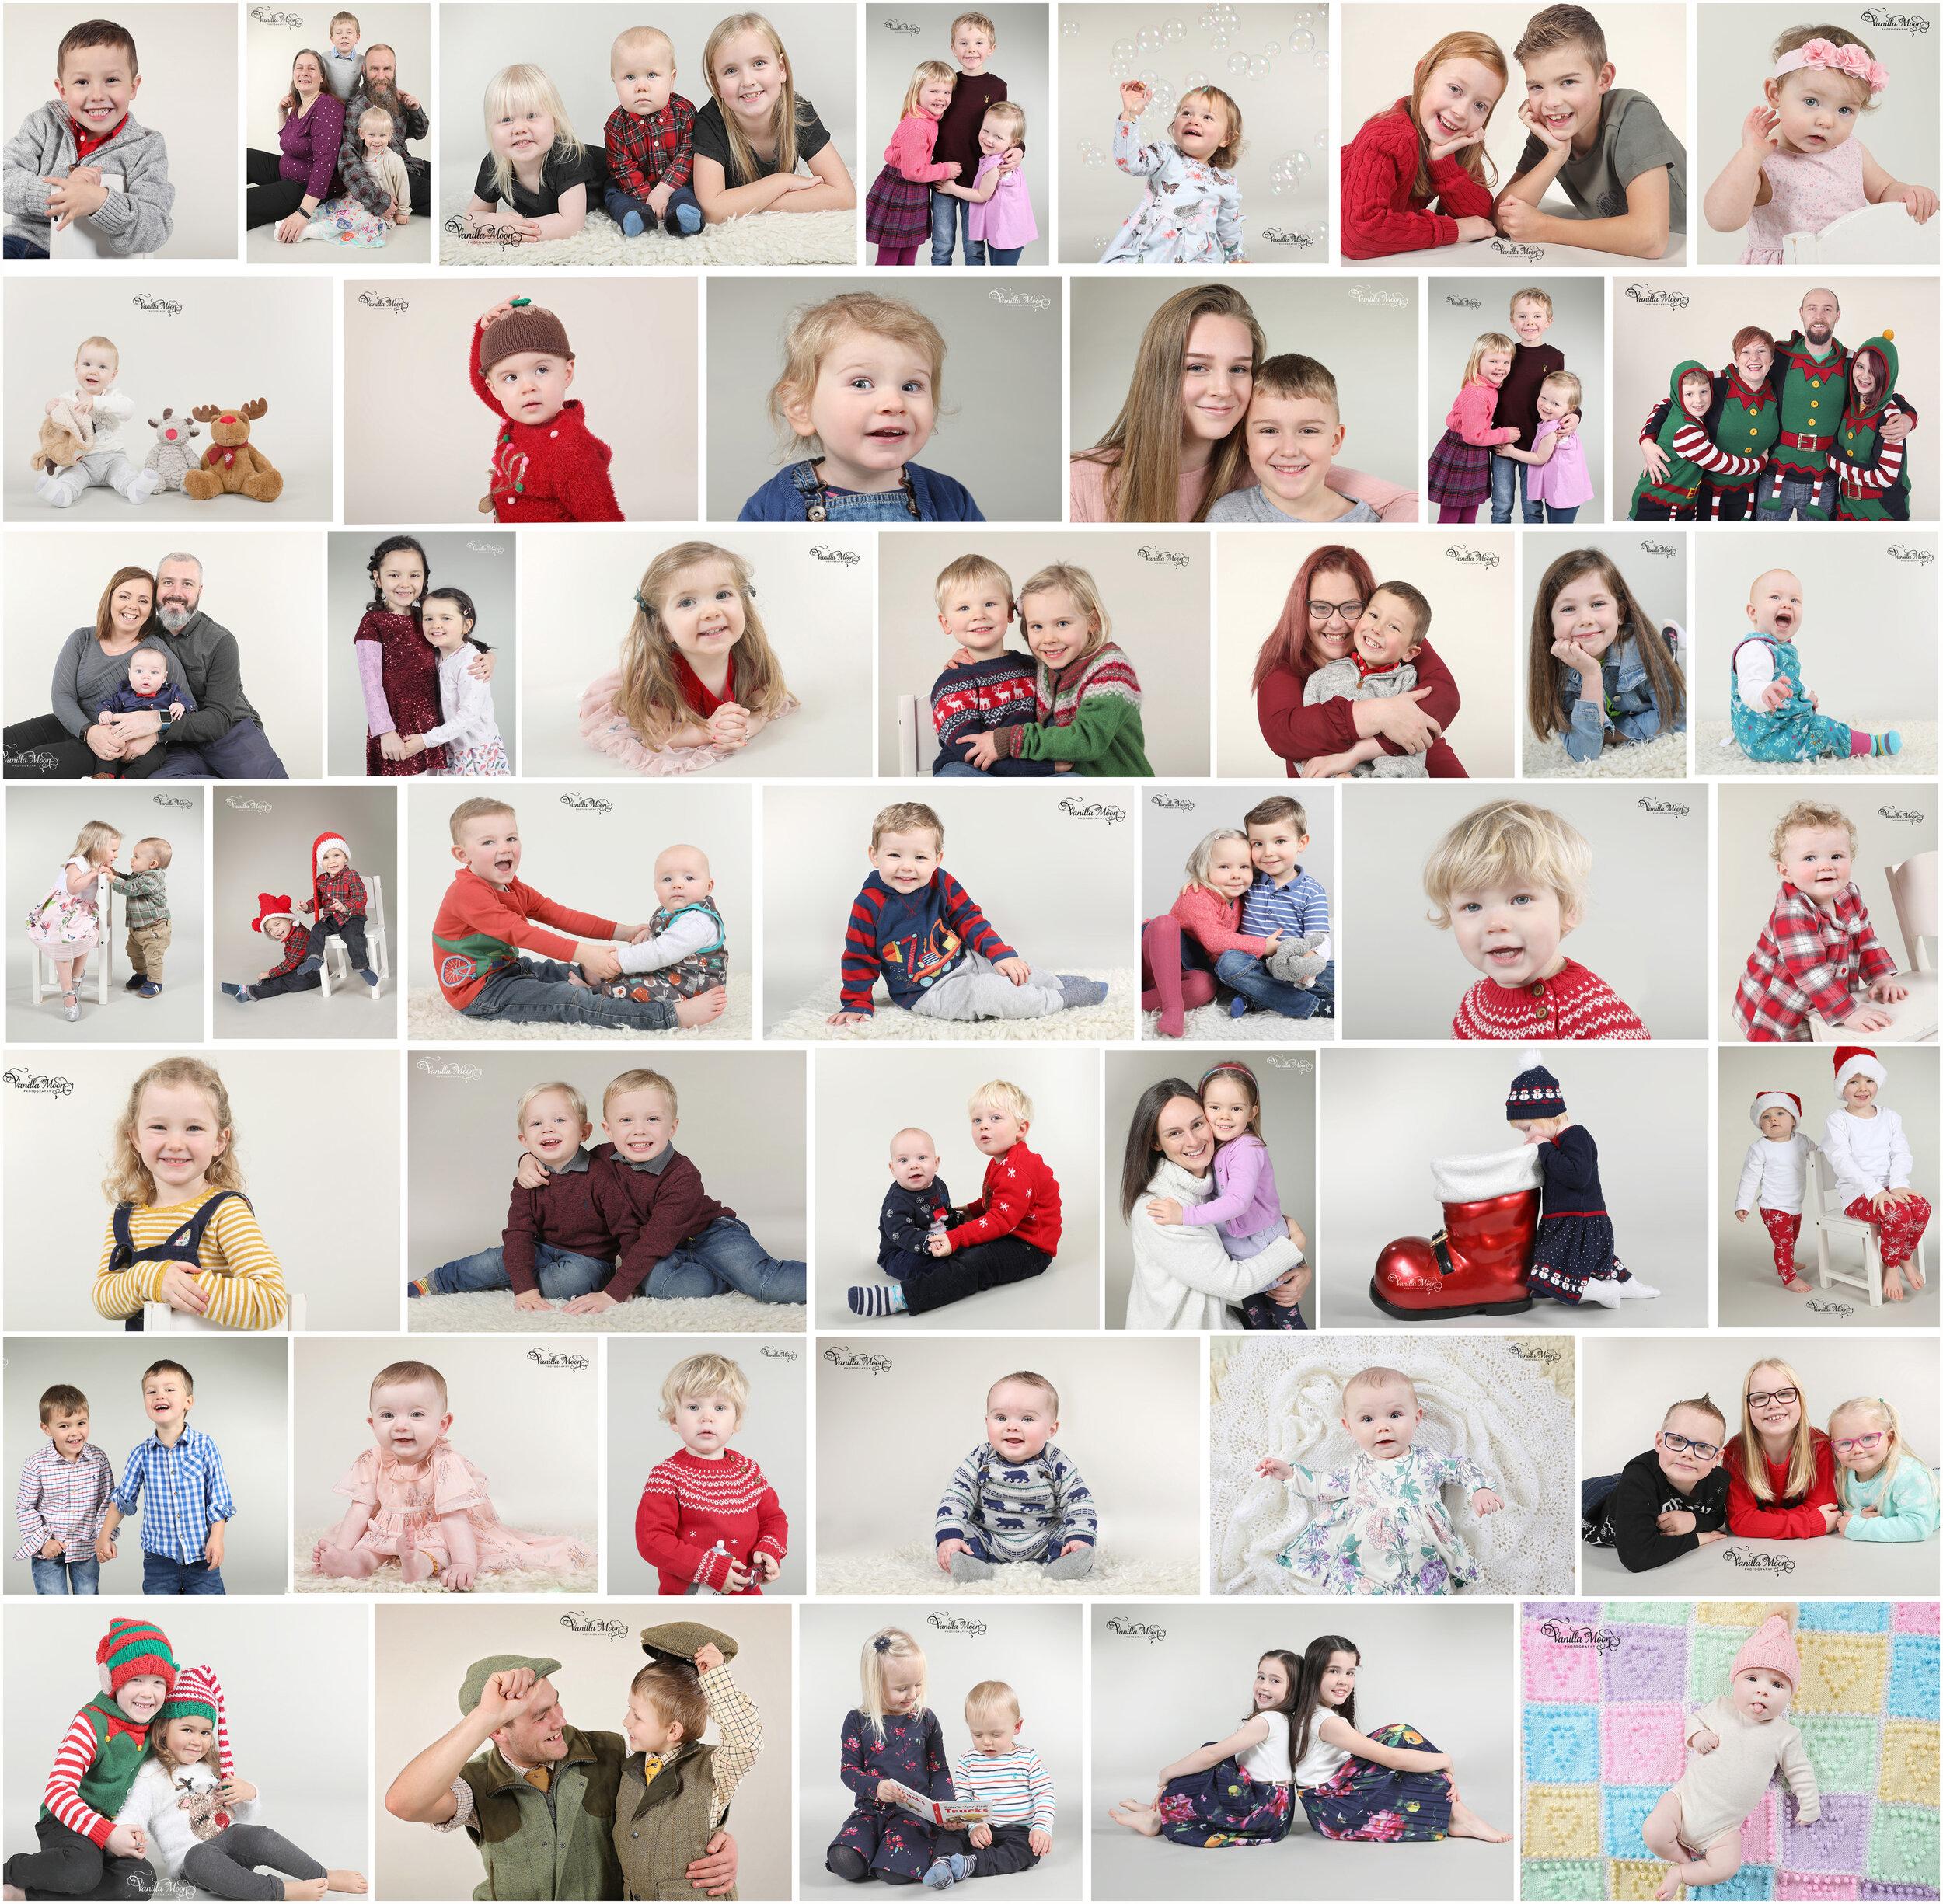 Christmas mini portrait sessions, peebles, Scottish Borders, Eddleston, Selkirk, Midlothian, Scotland